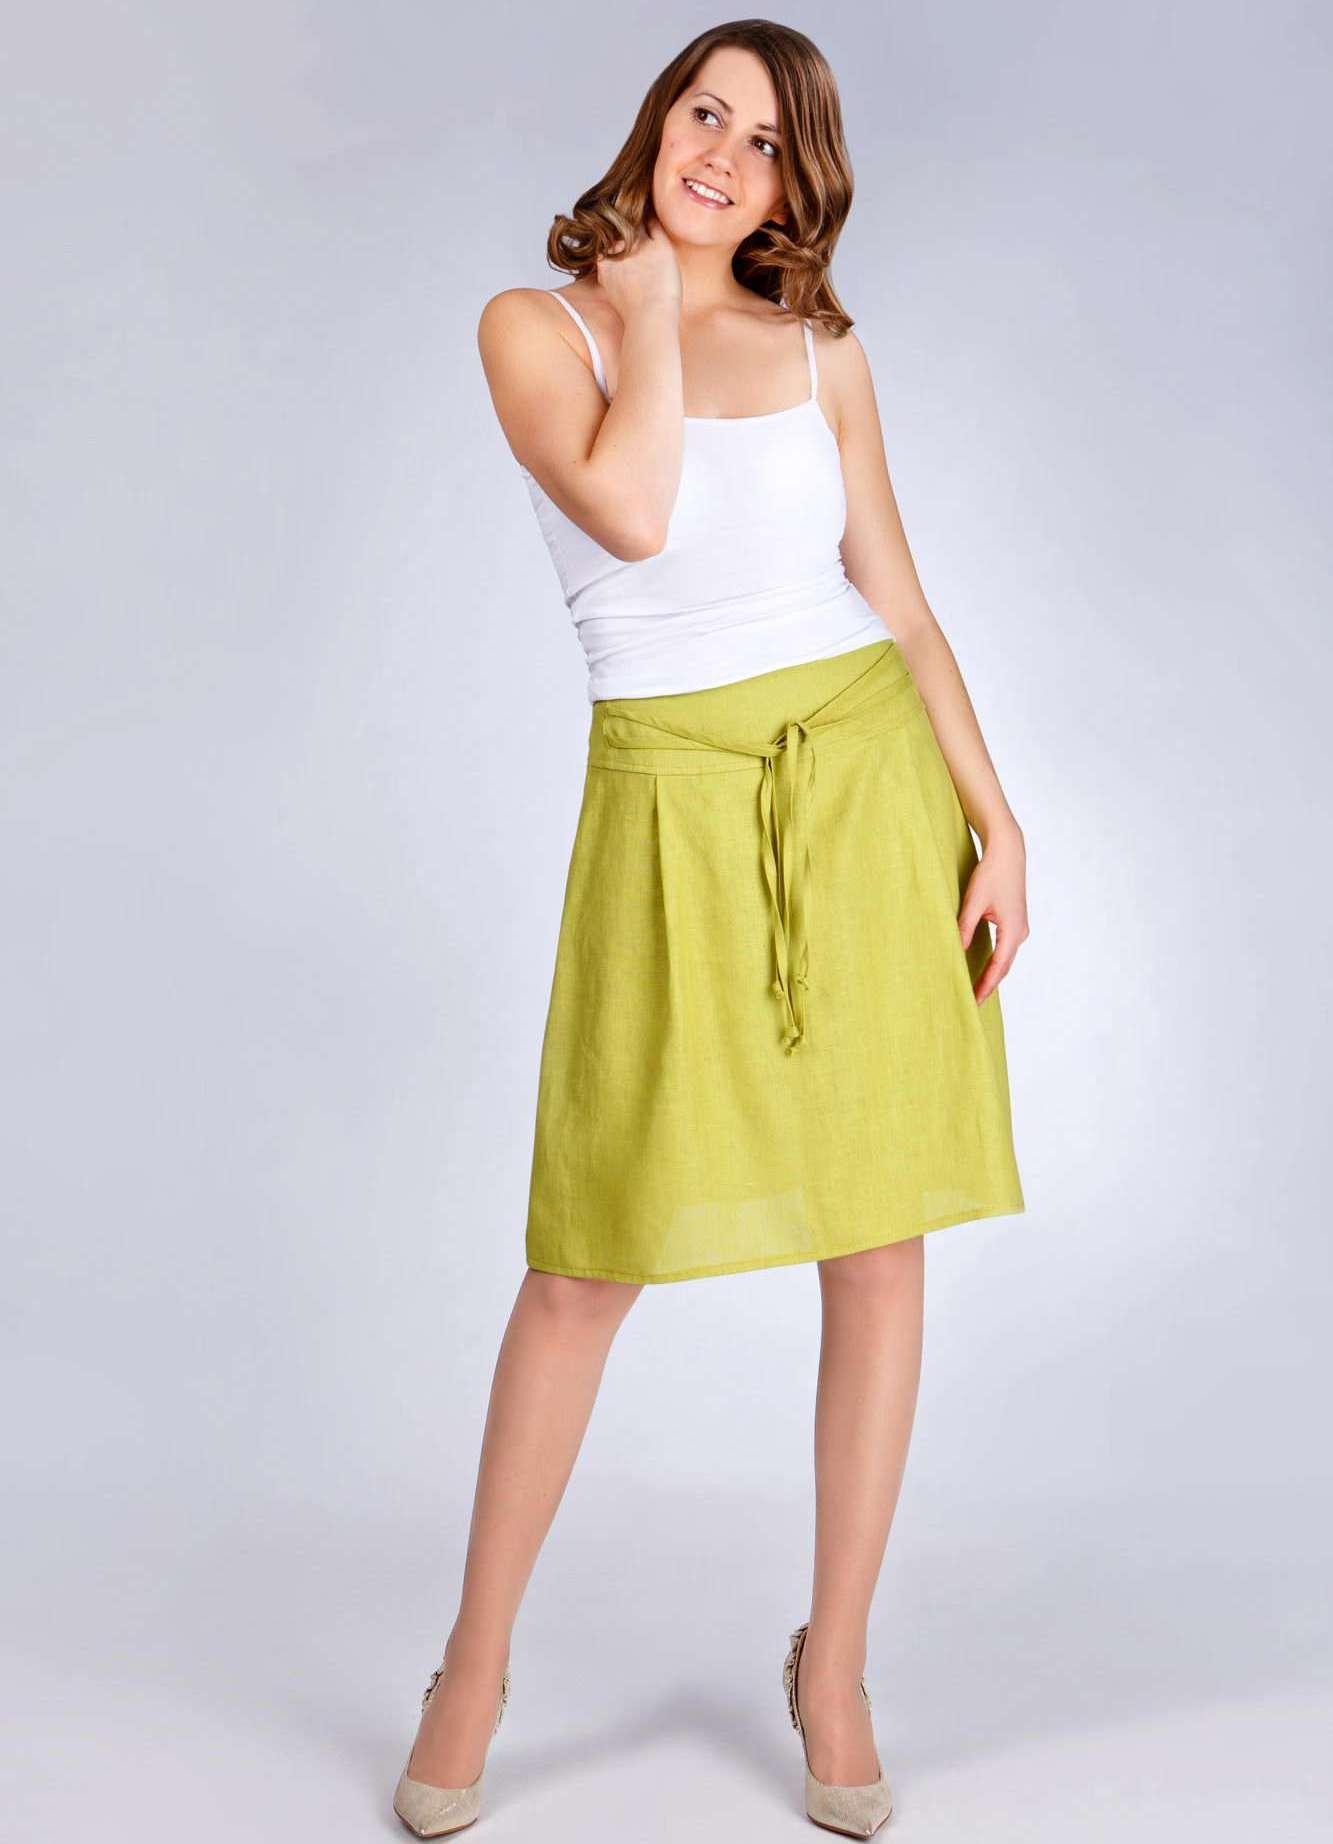 cd02af8a989a5e1 льняные юбки 1, льняные юбки 2 ...